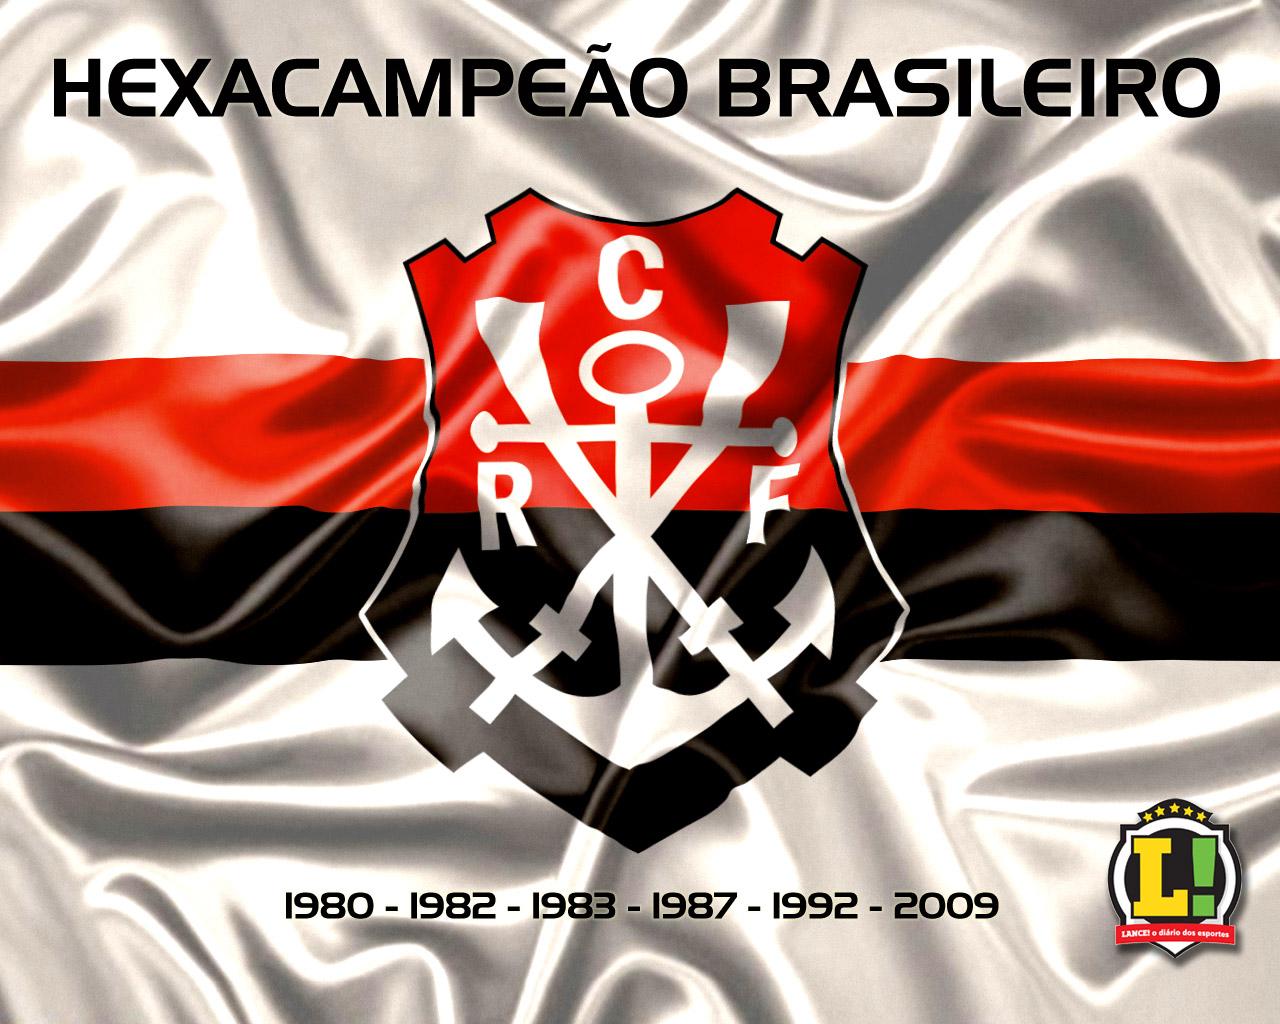 http://2.bp.blogspot.com/-49IZ85B9DOM/UOYamzgvy4I/AAAAAAABGLY/9JUuytMlI4Y/s1600/wallpaper-+Flamengo+-wallpaper+(17).jpg